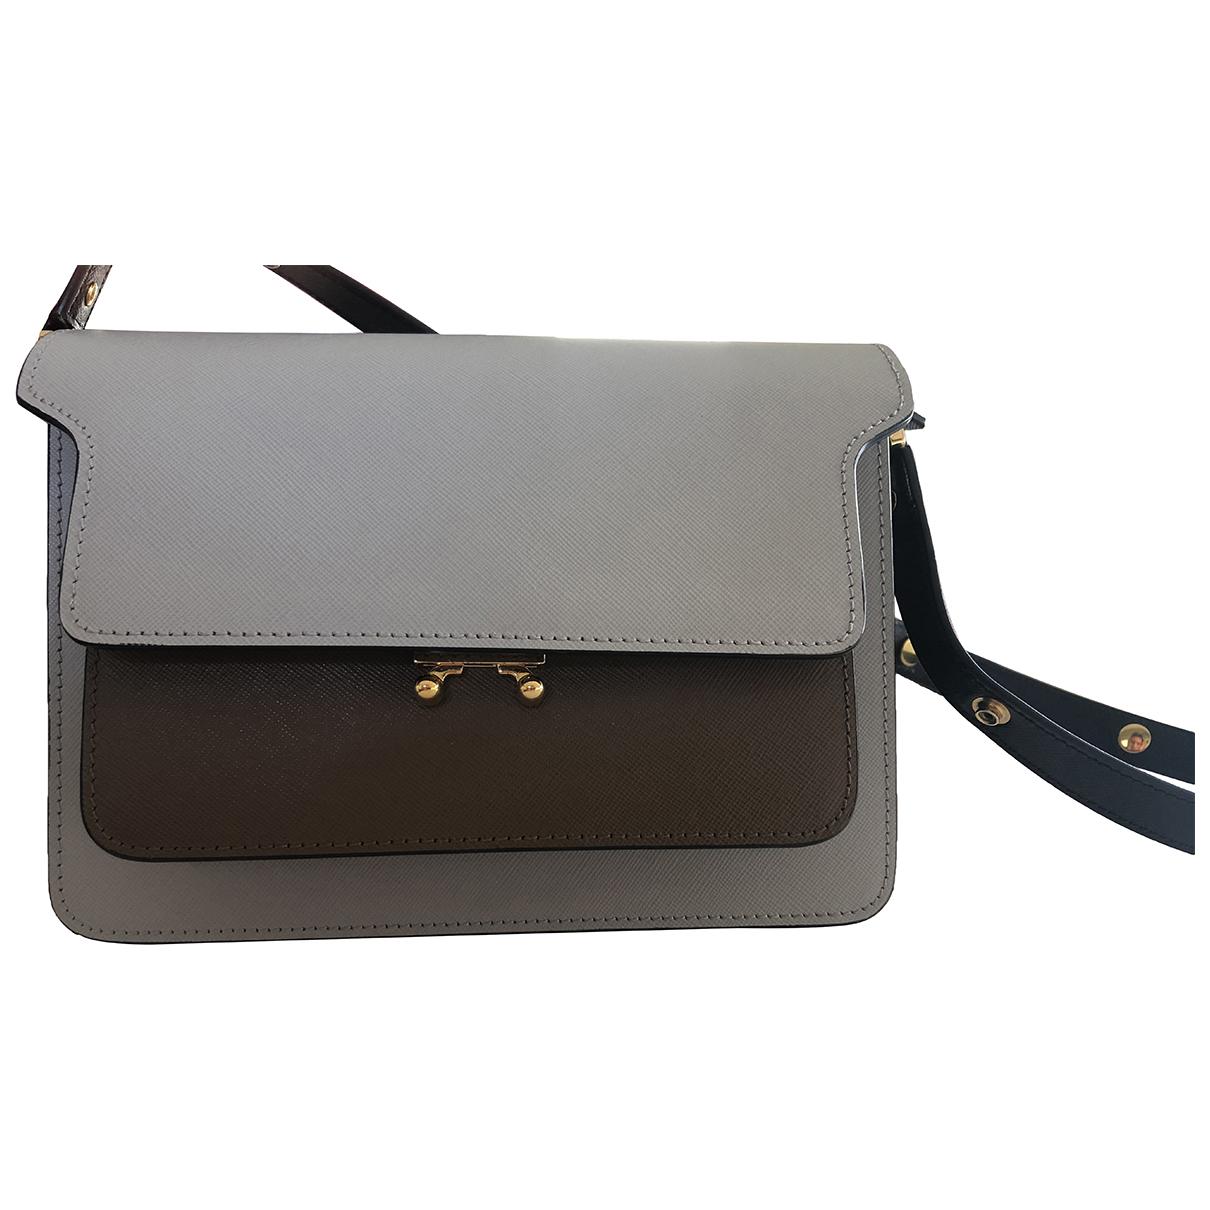 Marni Trunk Handtasche in  Bunt Leder